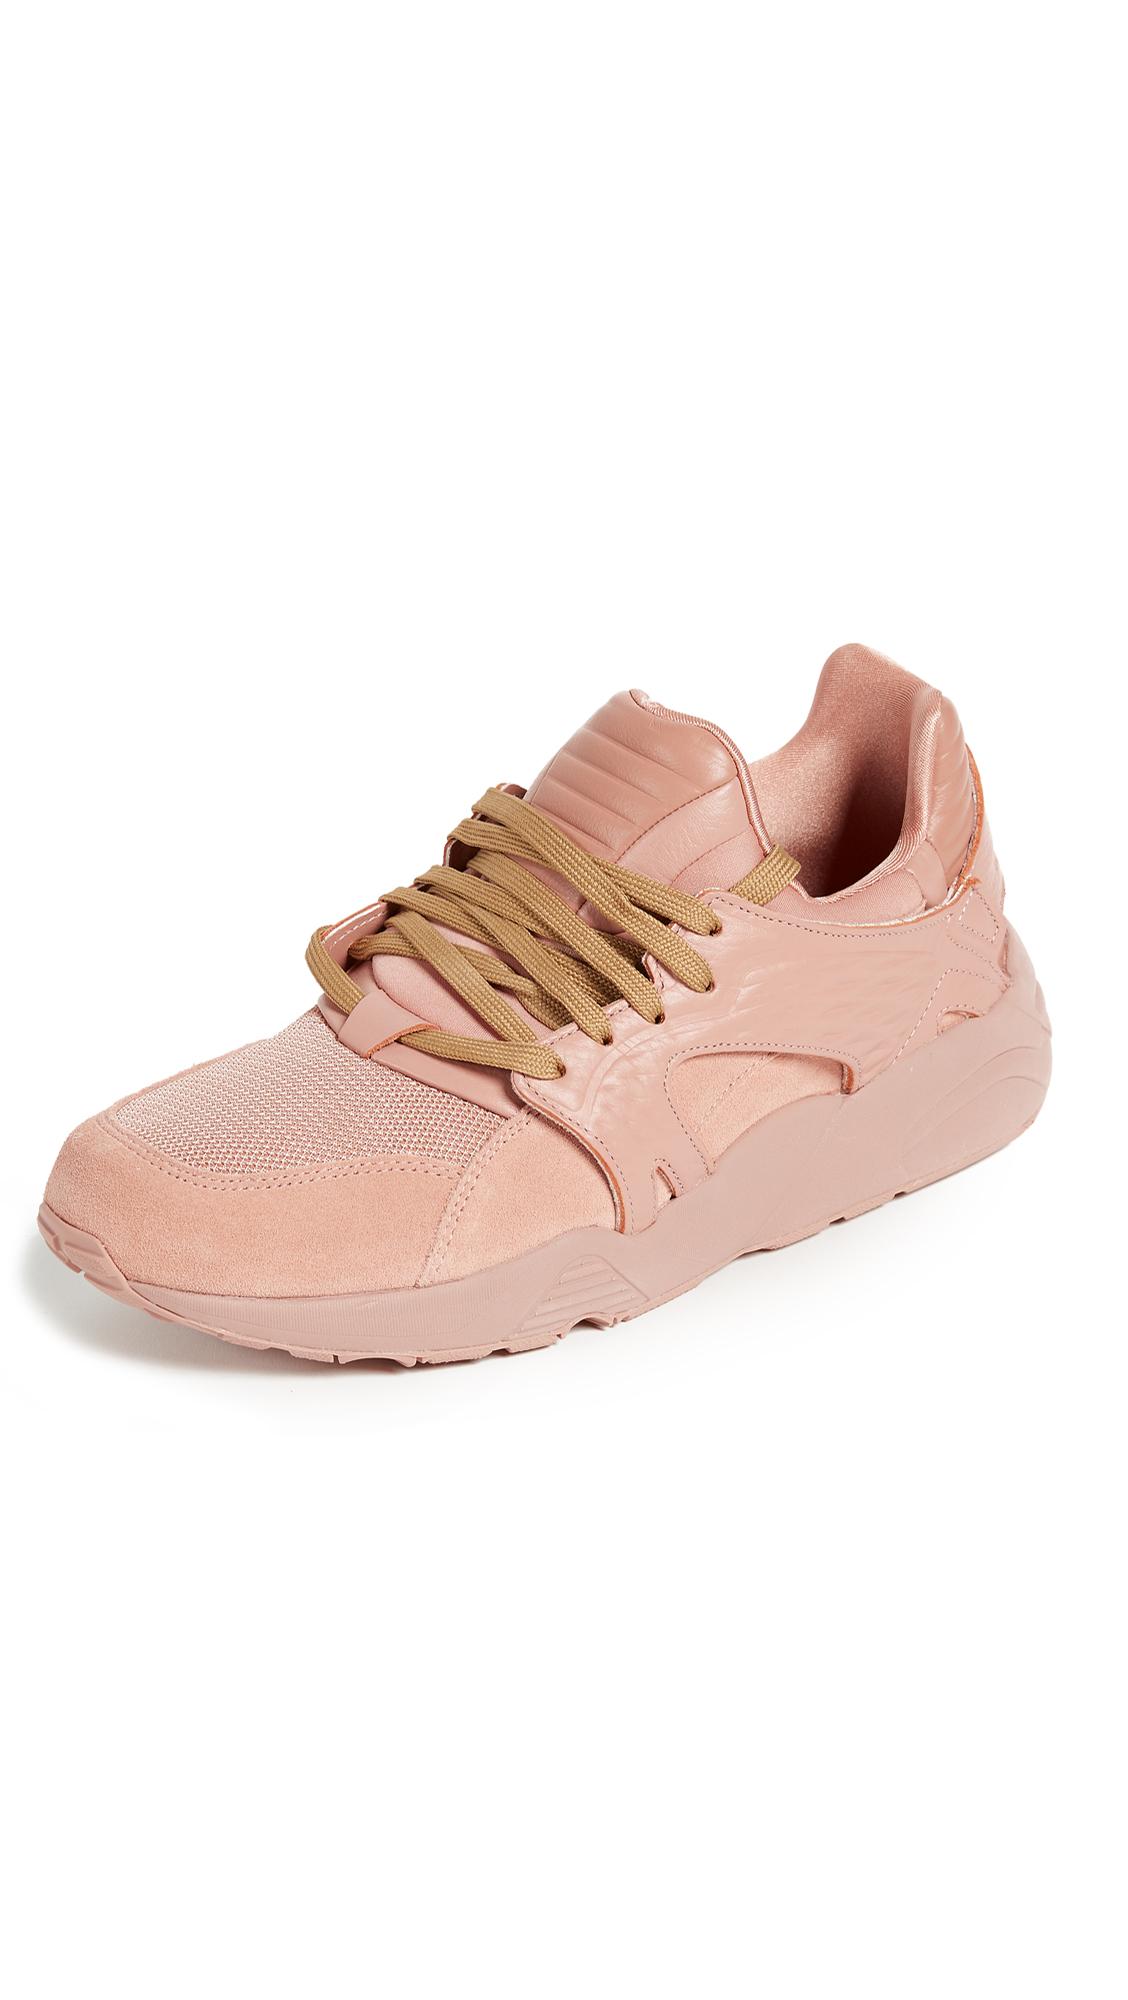 PUMA Select x Han Kjobenhavn Blaze of Glory Cage Sneaker